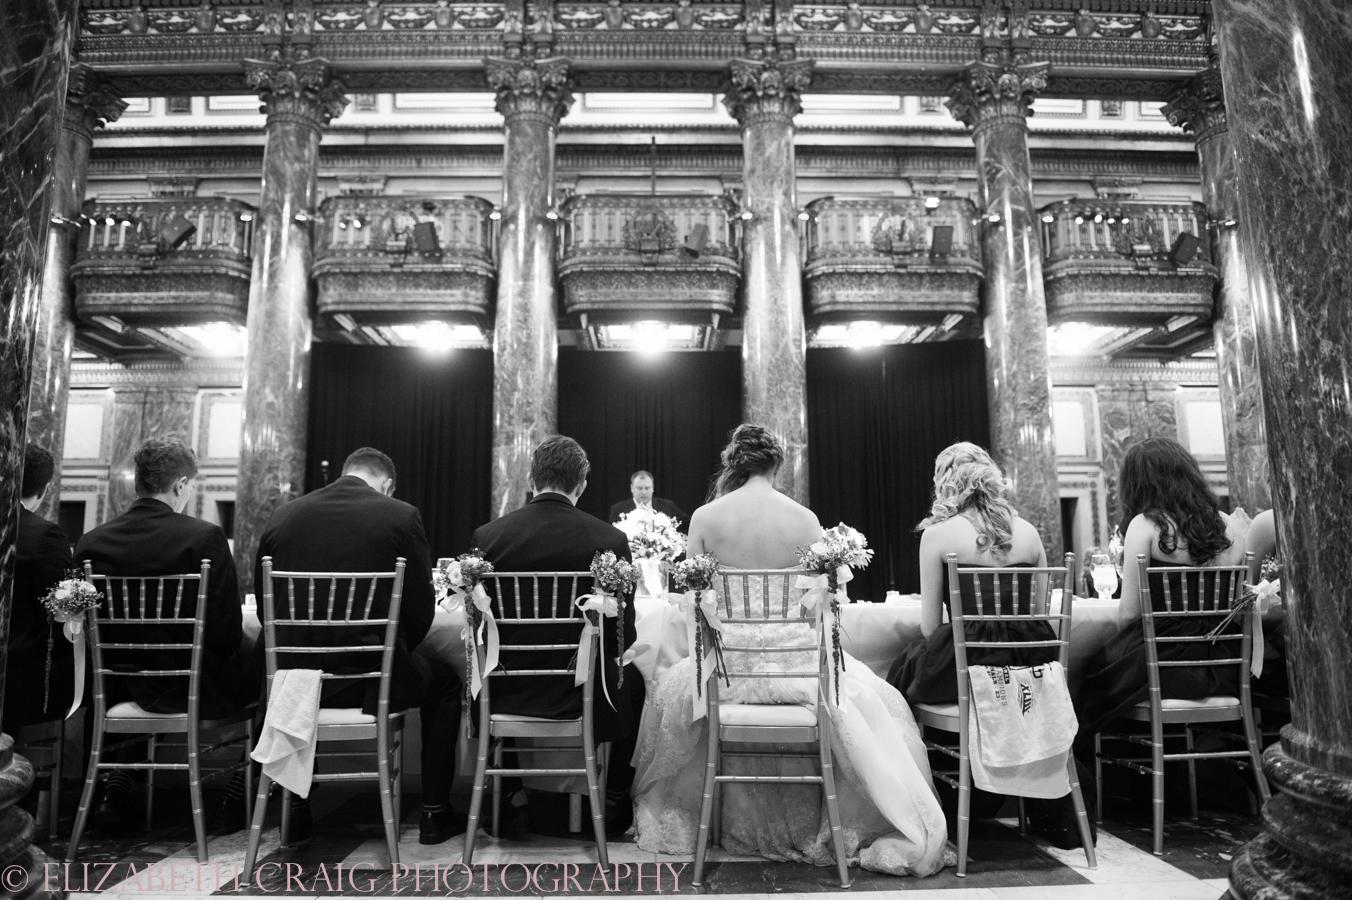 Carnegie Museum of Art Weddings | Elizabeth Craig Photography-0122